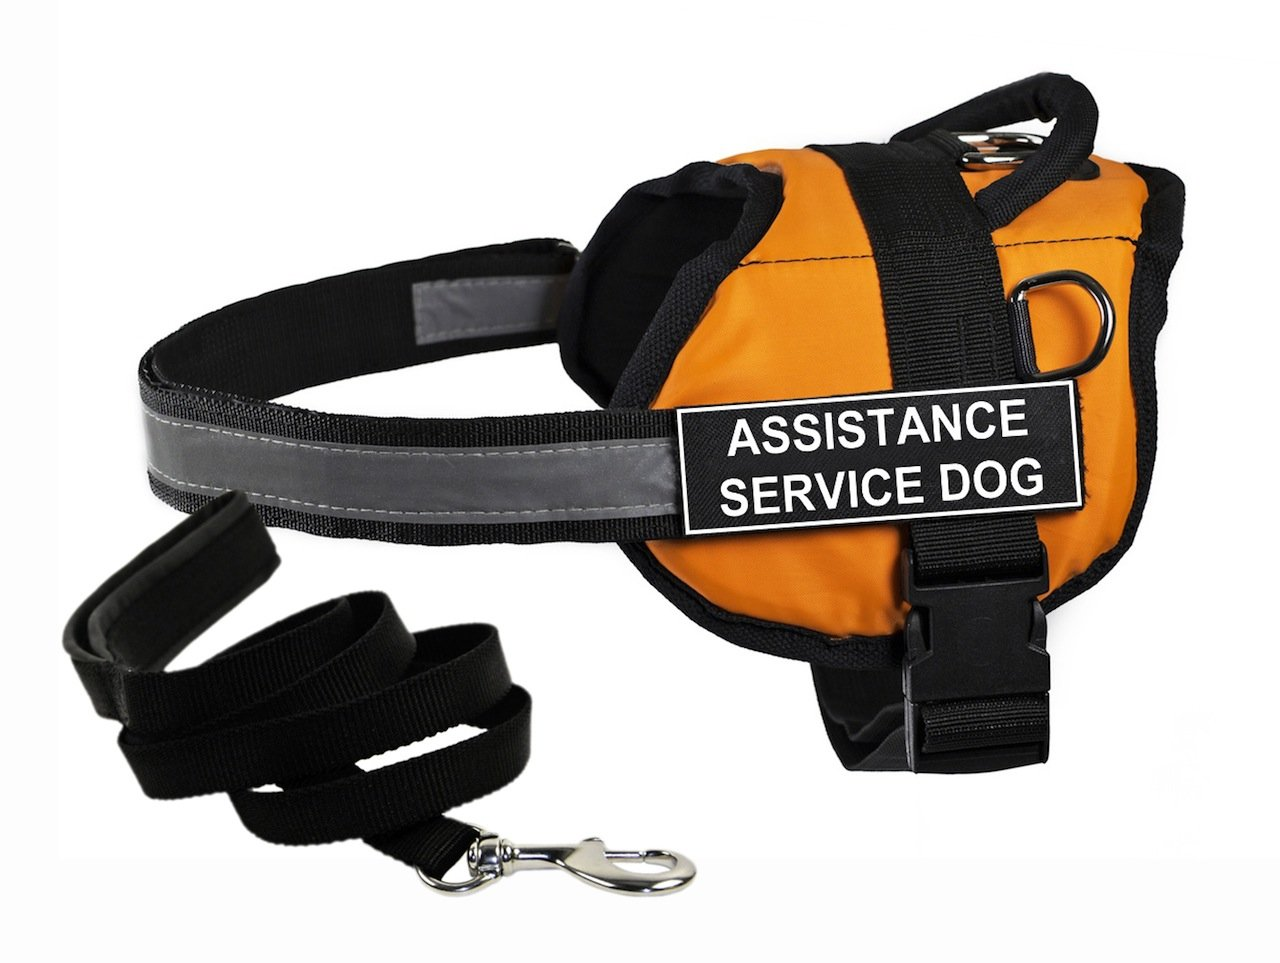 Dean & Tyler DT Works Works Works Arancione Imbracatura con Servizio Assistenza Dog, Media, e Nero 1,8 m Padded Puppy guinzaglio. 98048c